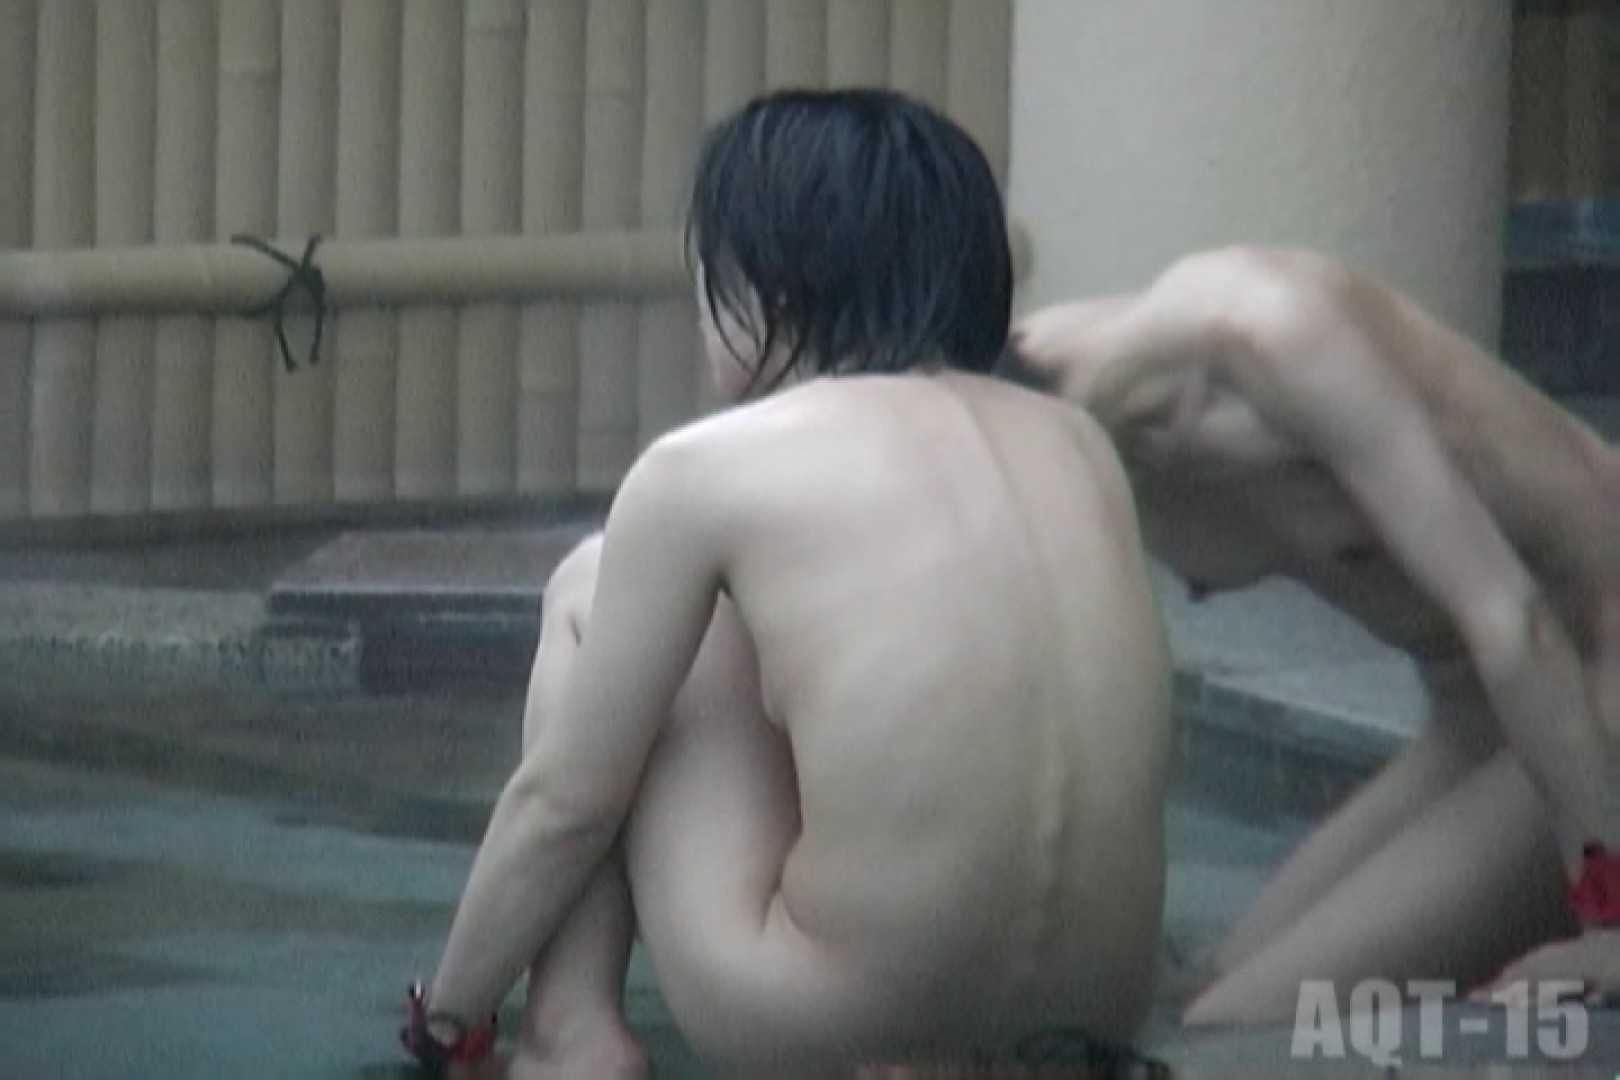 Aquaな露天風呂Vol.837 エッチな盗撮 エロ無料画像 103pic 88